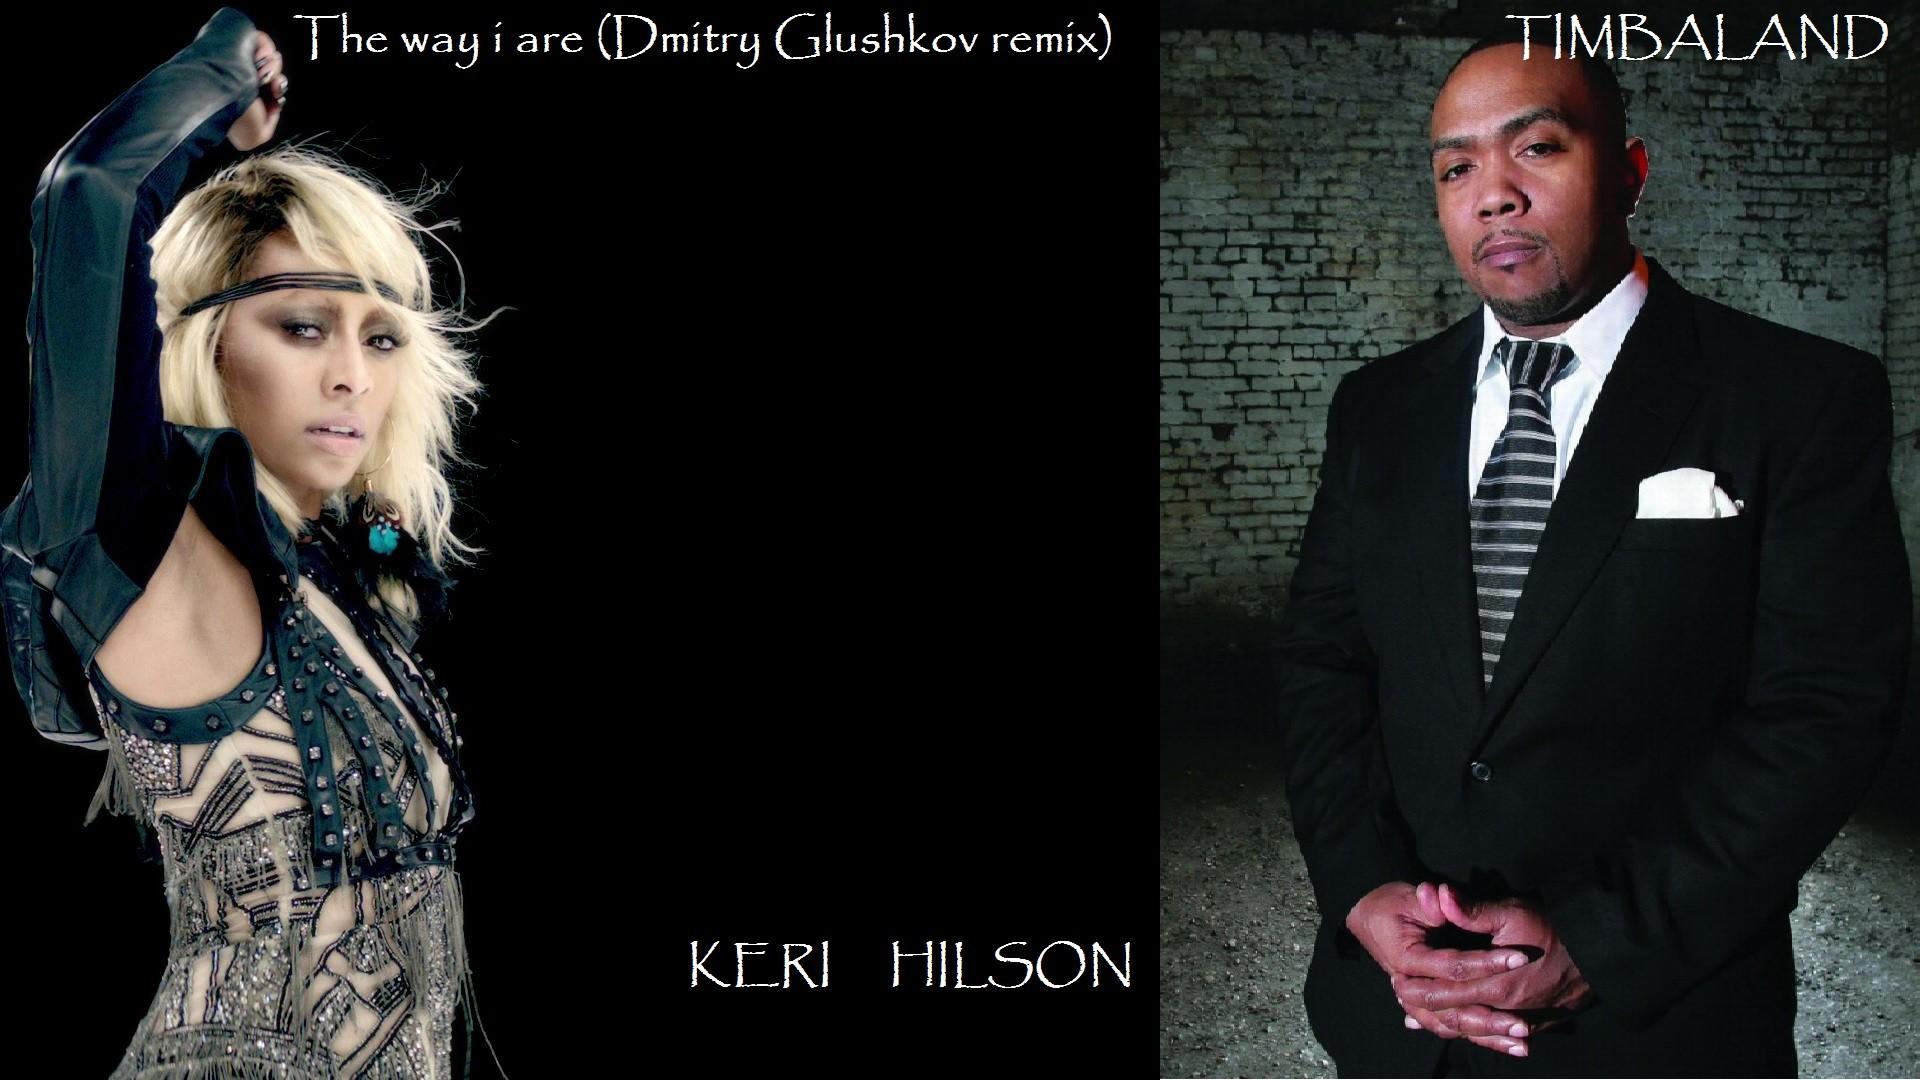 Timbaland feat  Keri Hilson – The way i are (Dmitry Glushkov